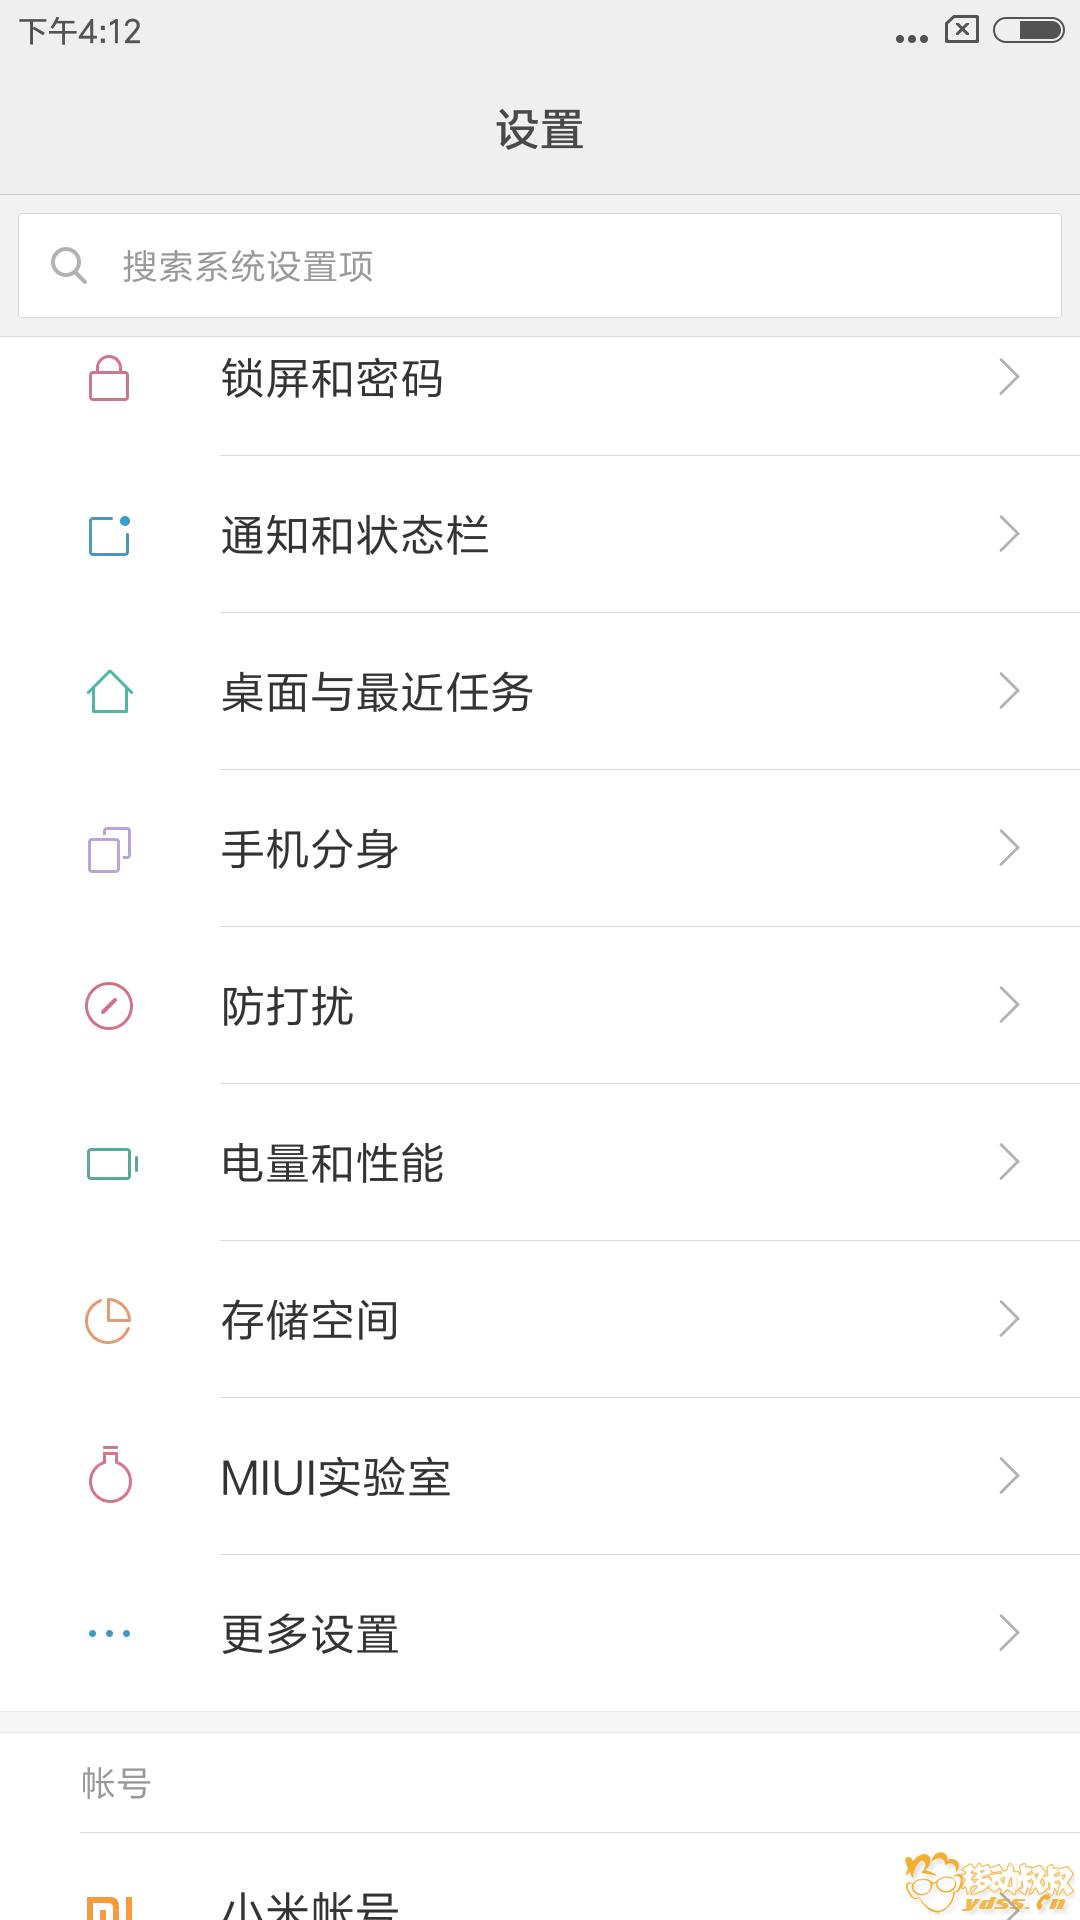 Screenshot_2018-04-01-16-12-46-595_com.android.settings.png